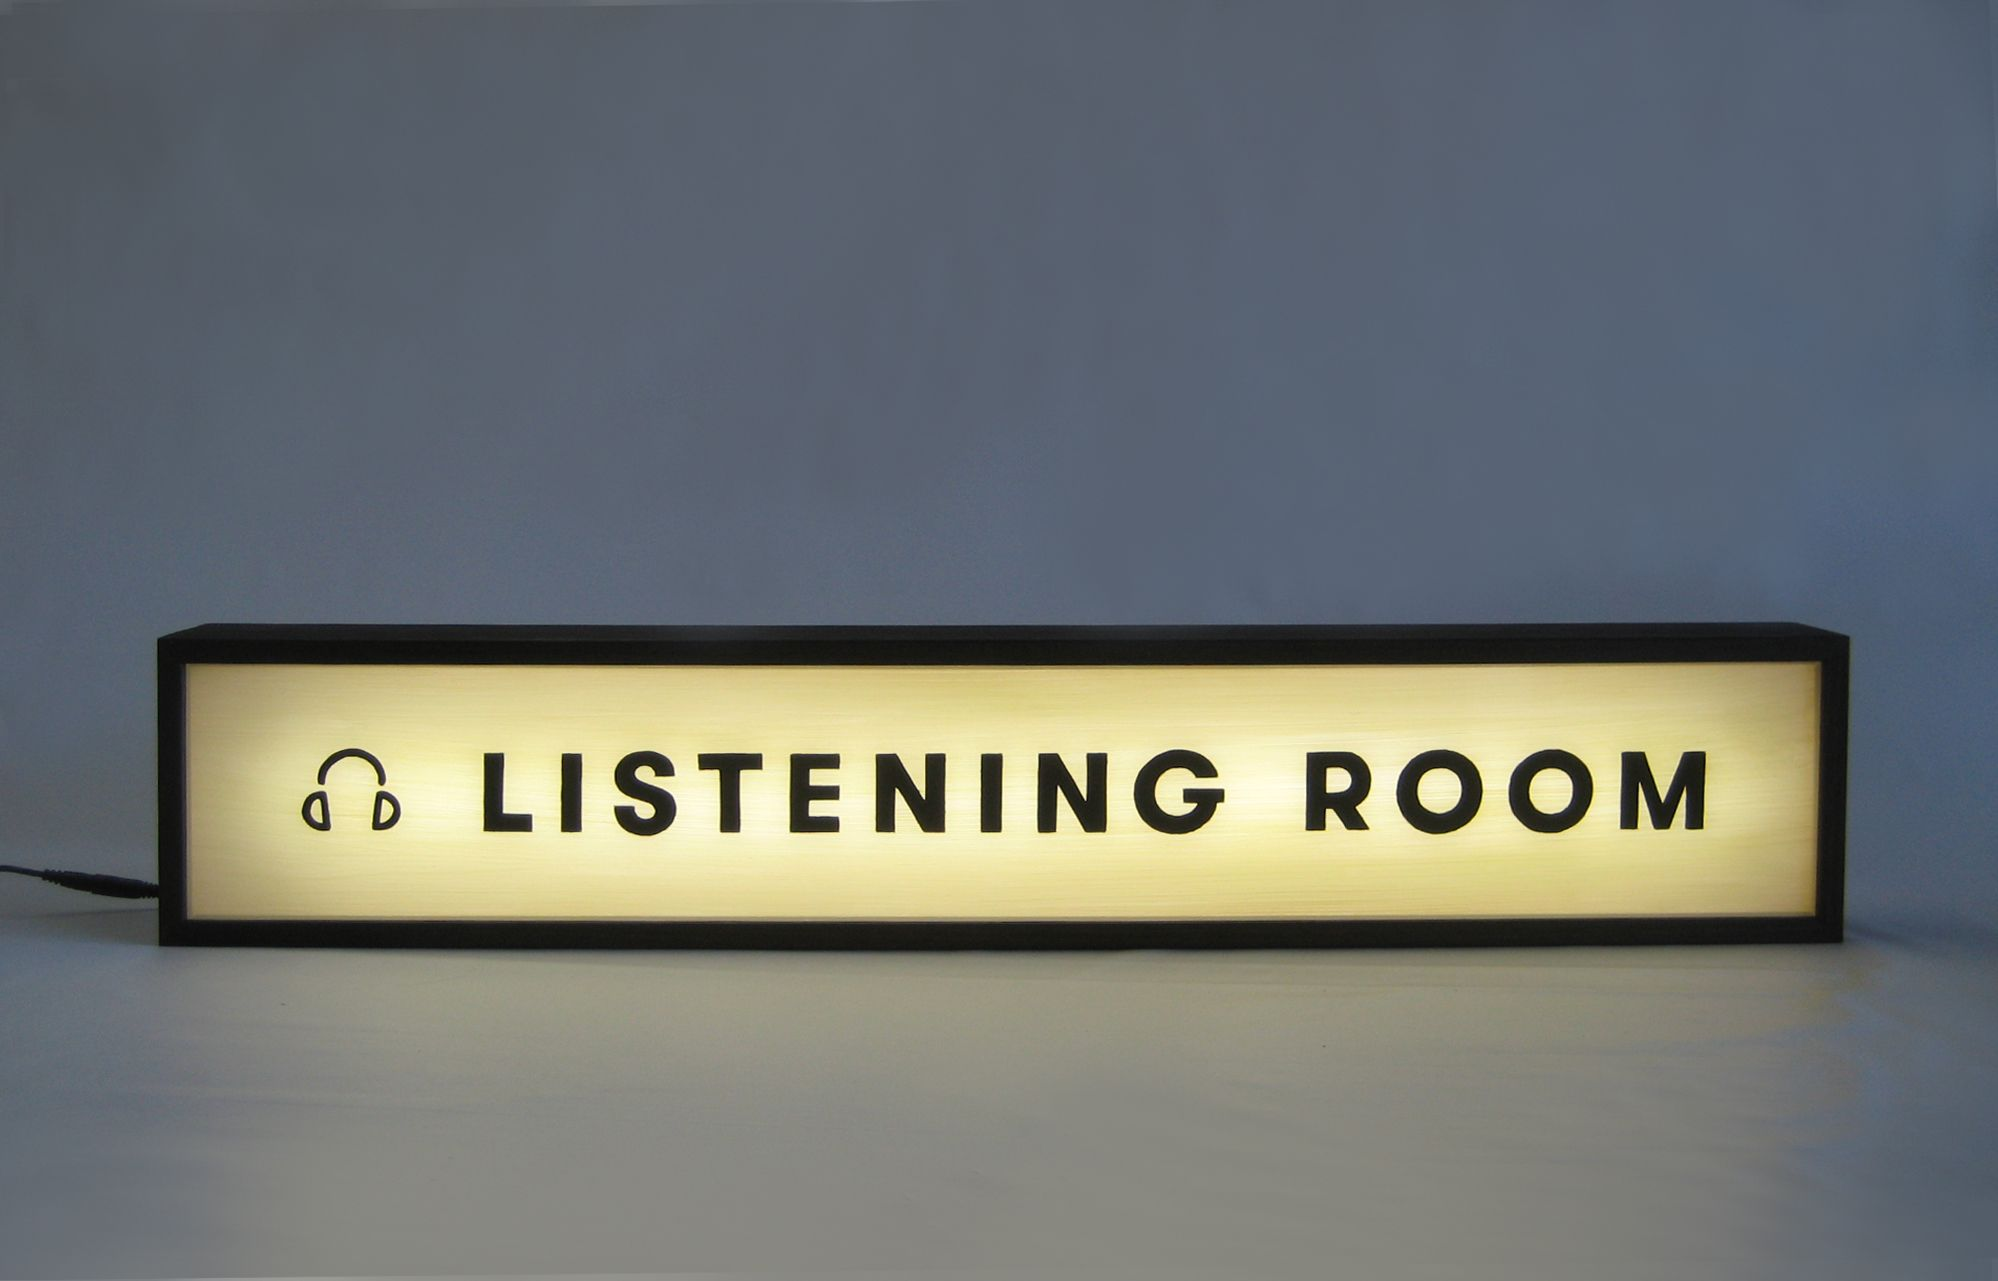 Custom Lightbox Handpainted Sign Delivered to Pitchfork Media, World